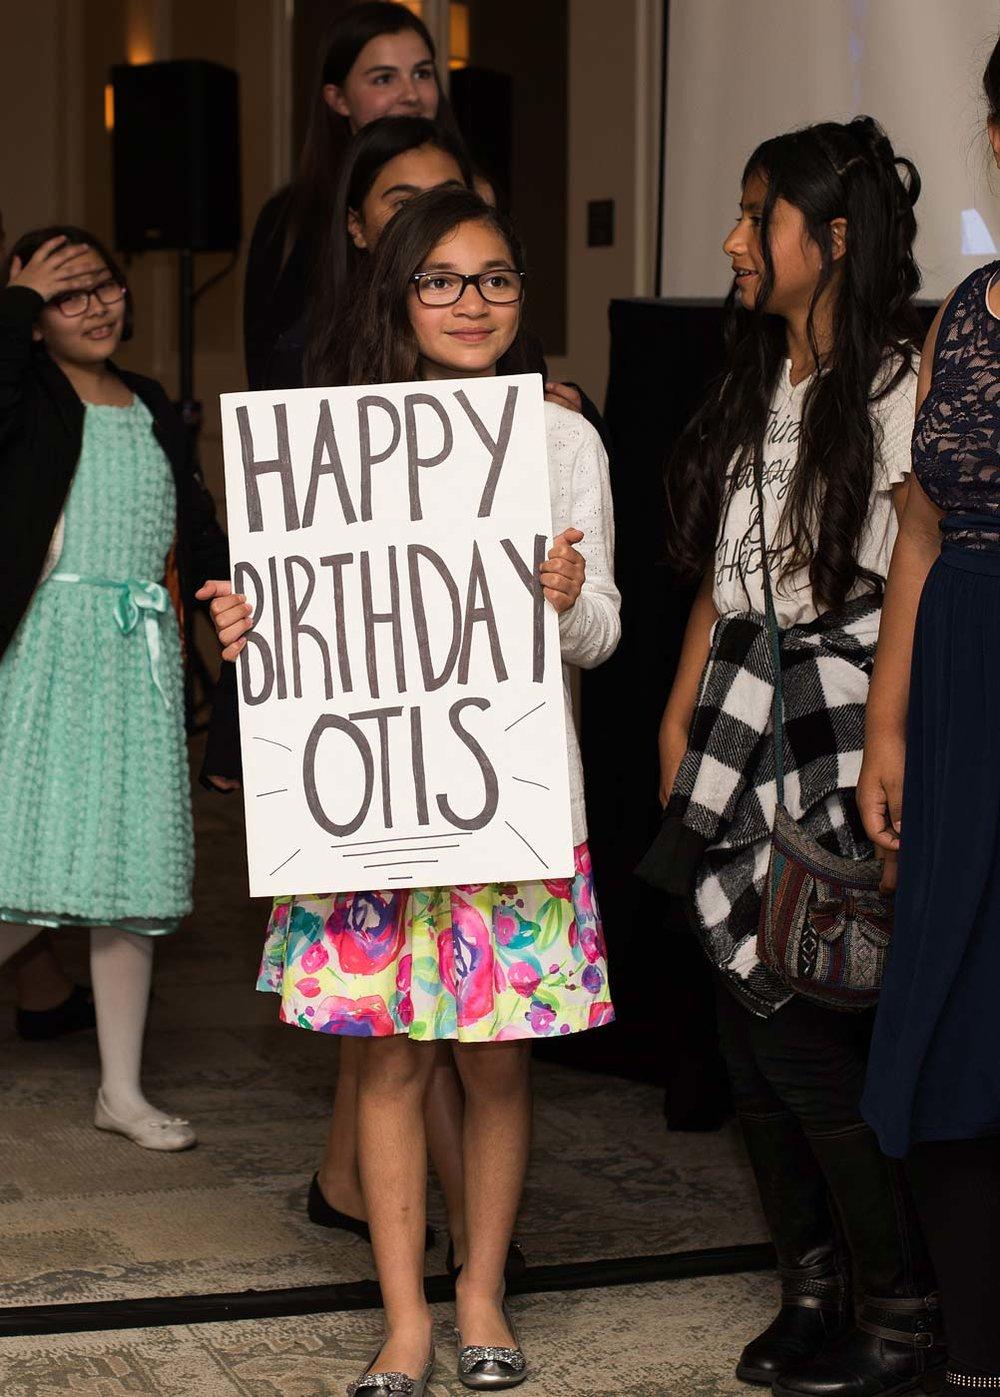 sAbsolut-Otis---90th-Birthday,-The-Ranch-Laguna-Beach-114.jpg